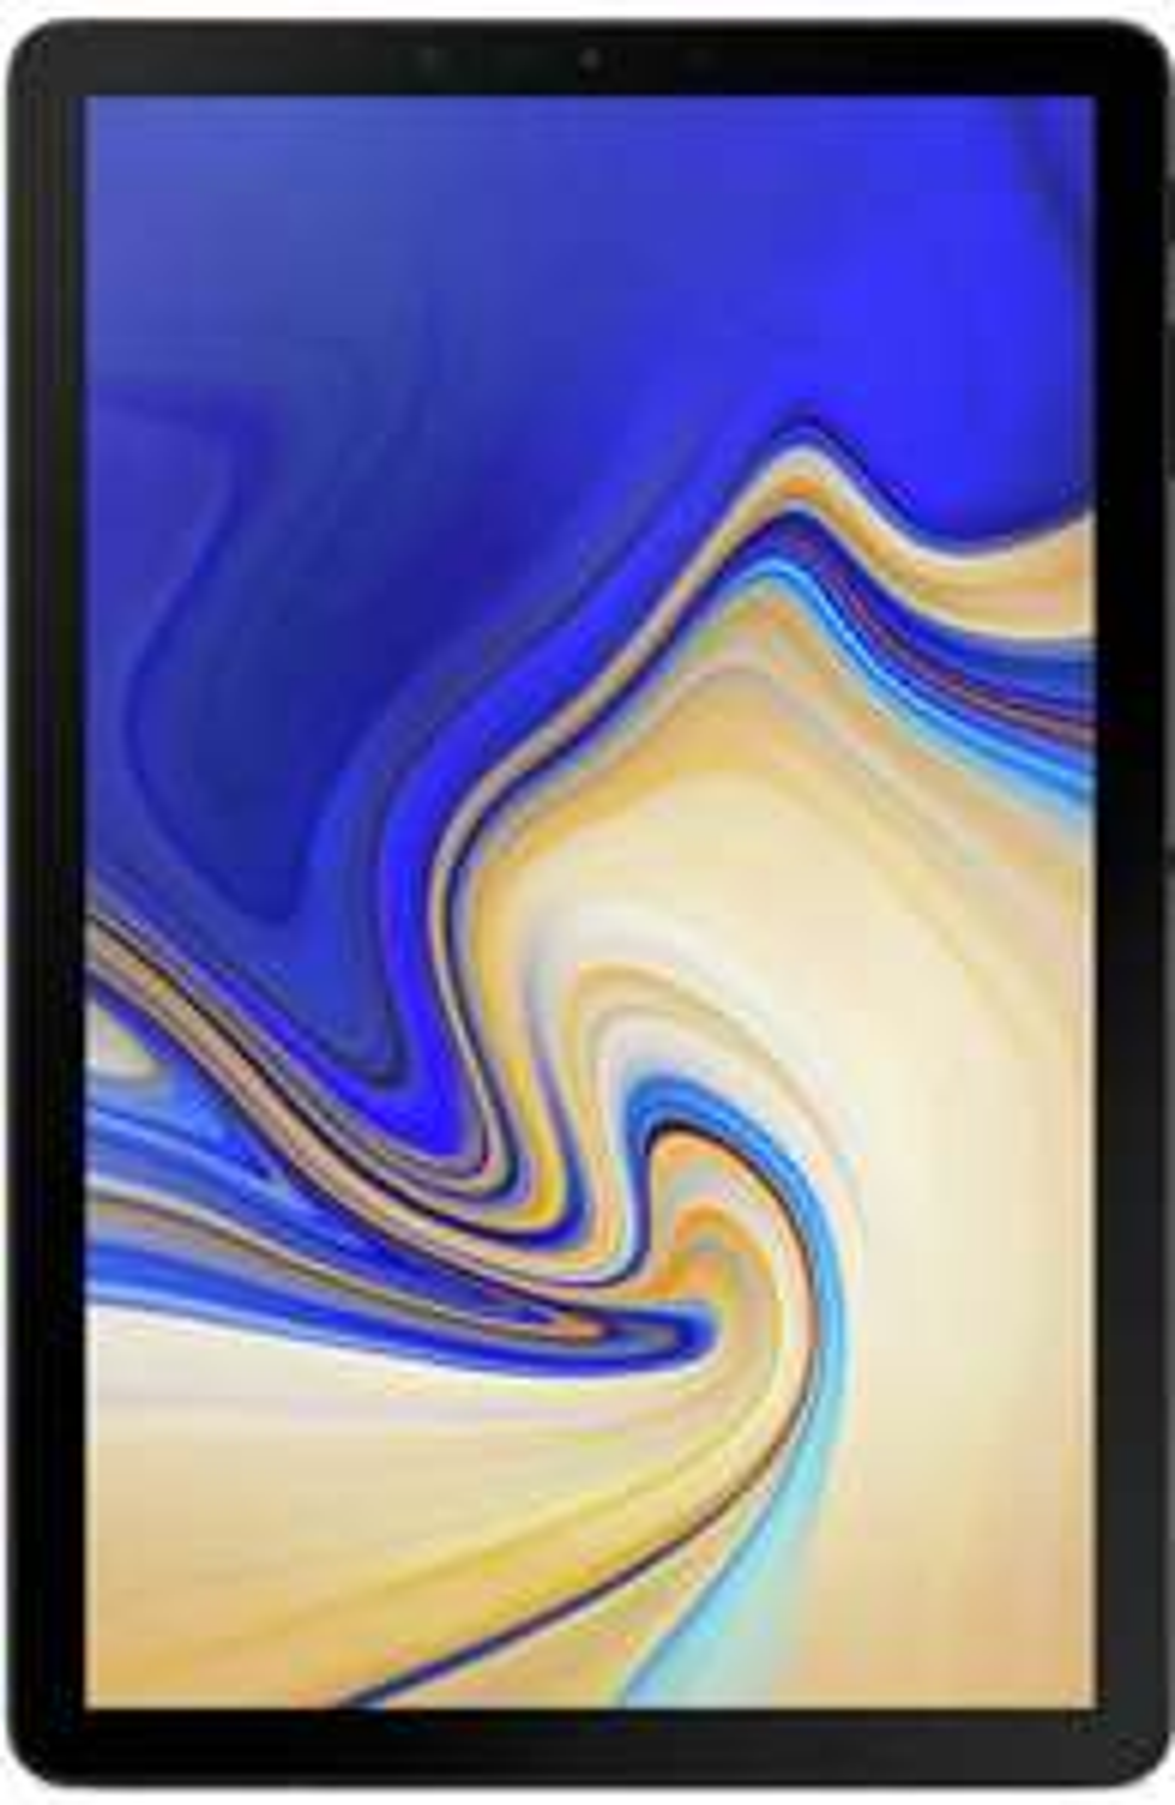 Samsung galaxy tab S4 64GB WiFi 4G Black refurbished excellent - £291.02 (With Code) @ eBay / envirofoneshop